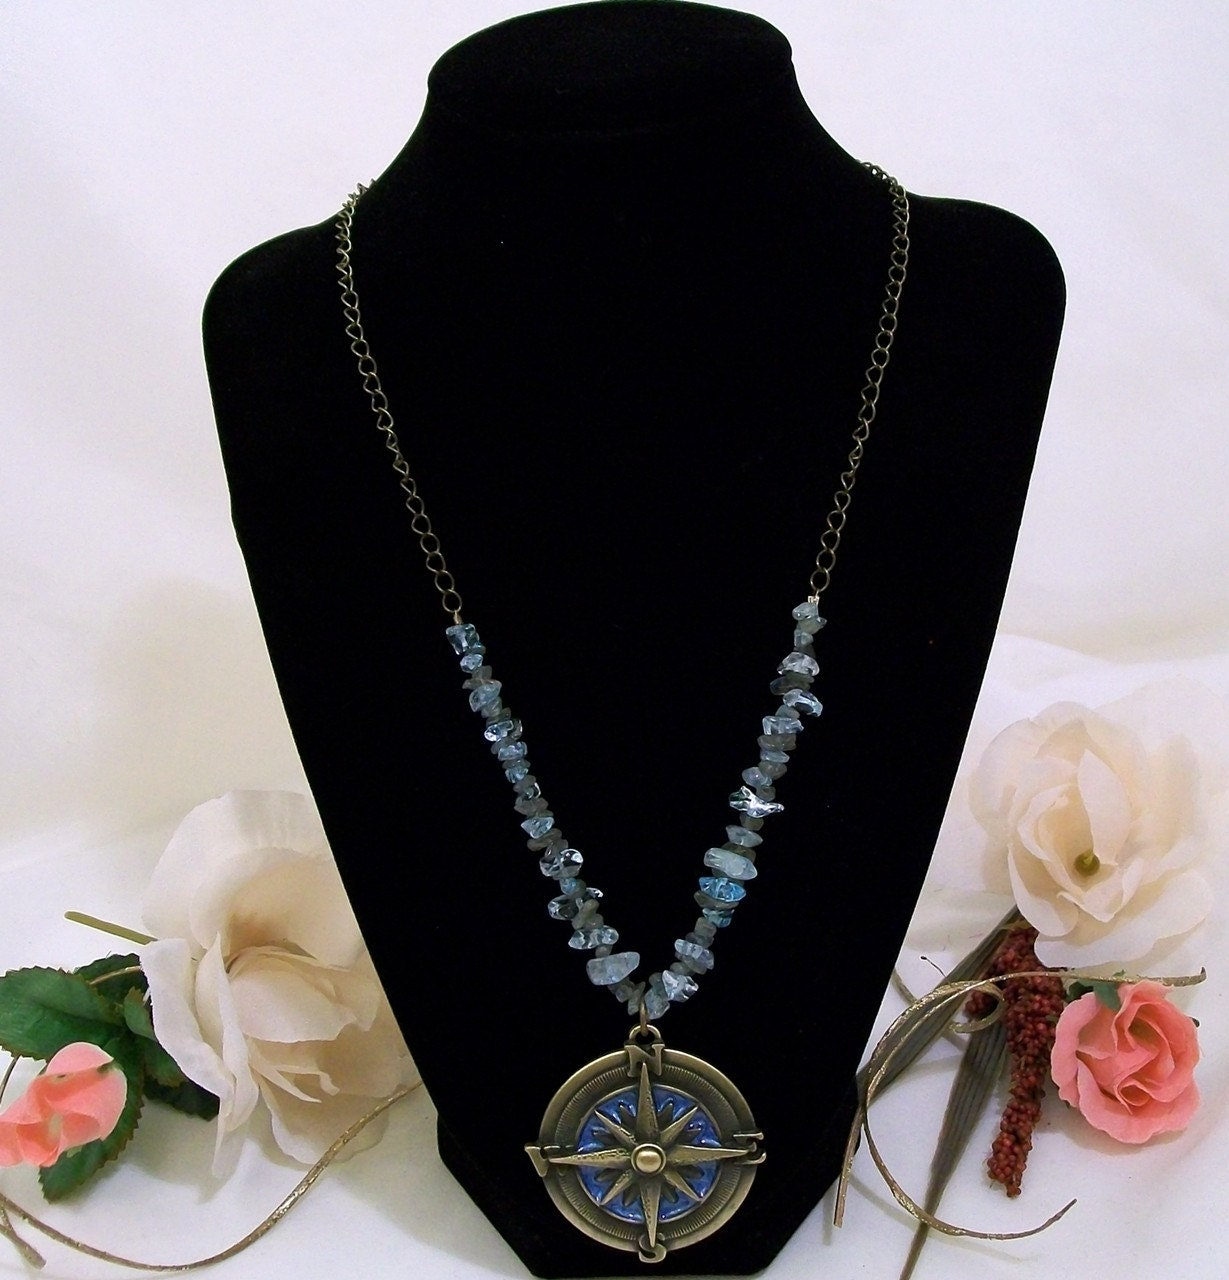 Circle of Balance Labradorite Necklace